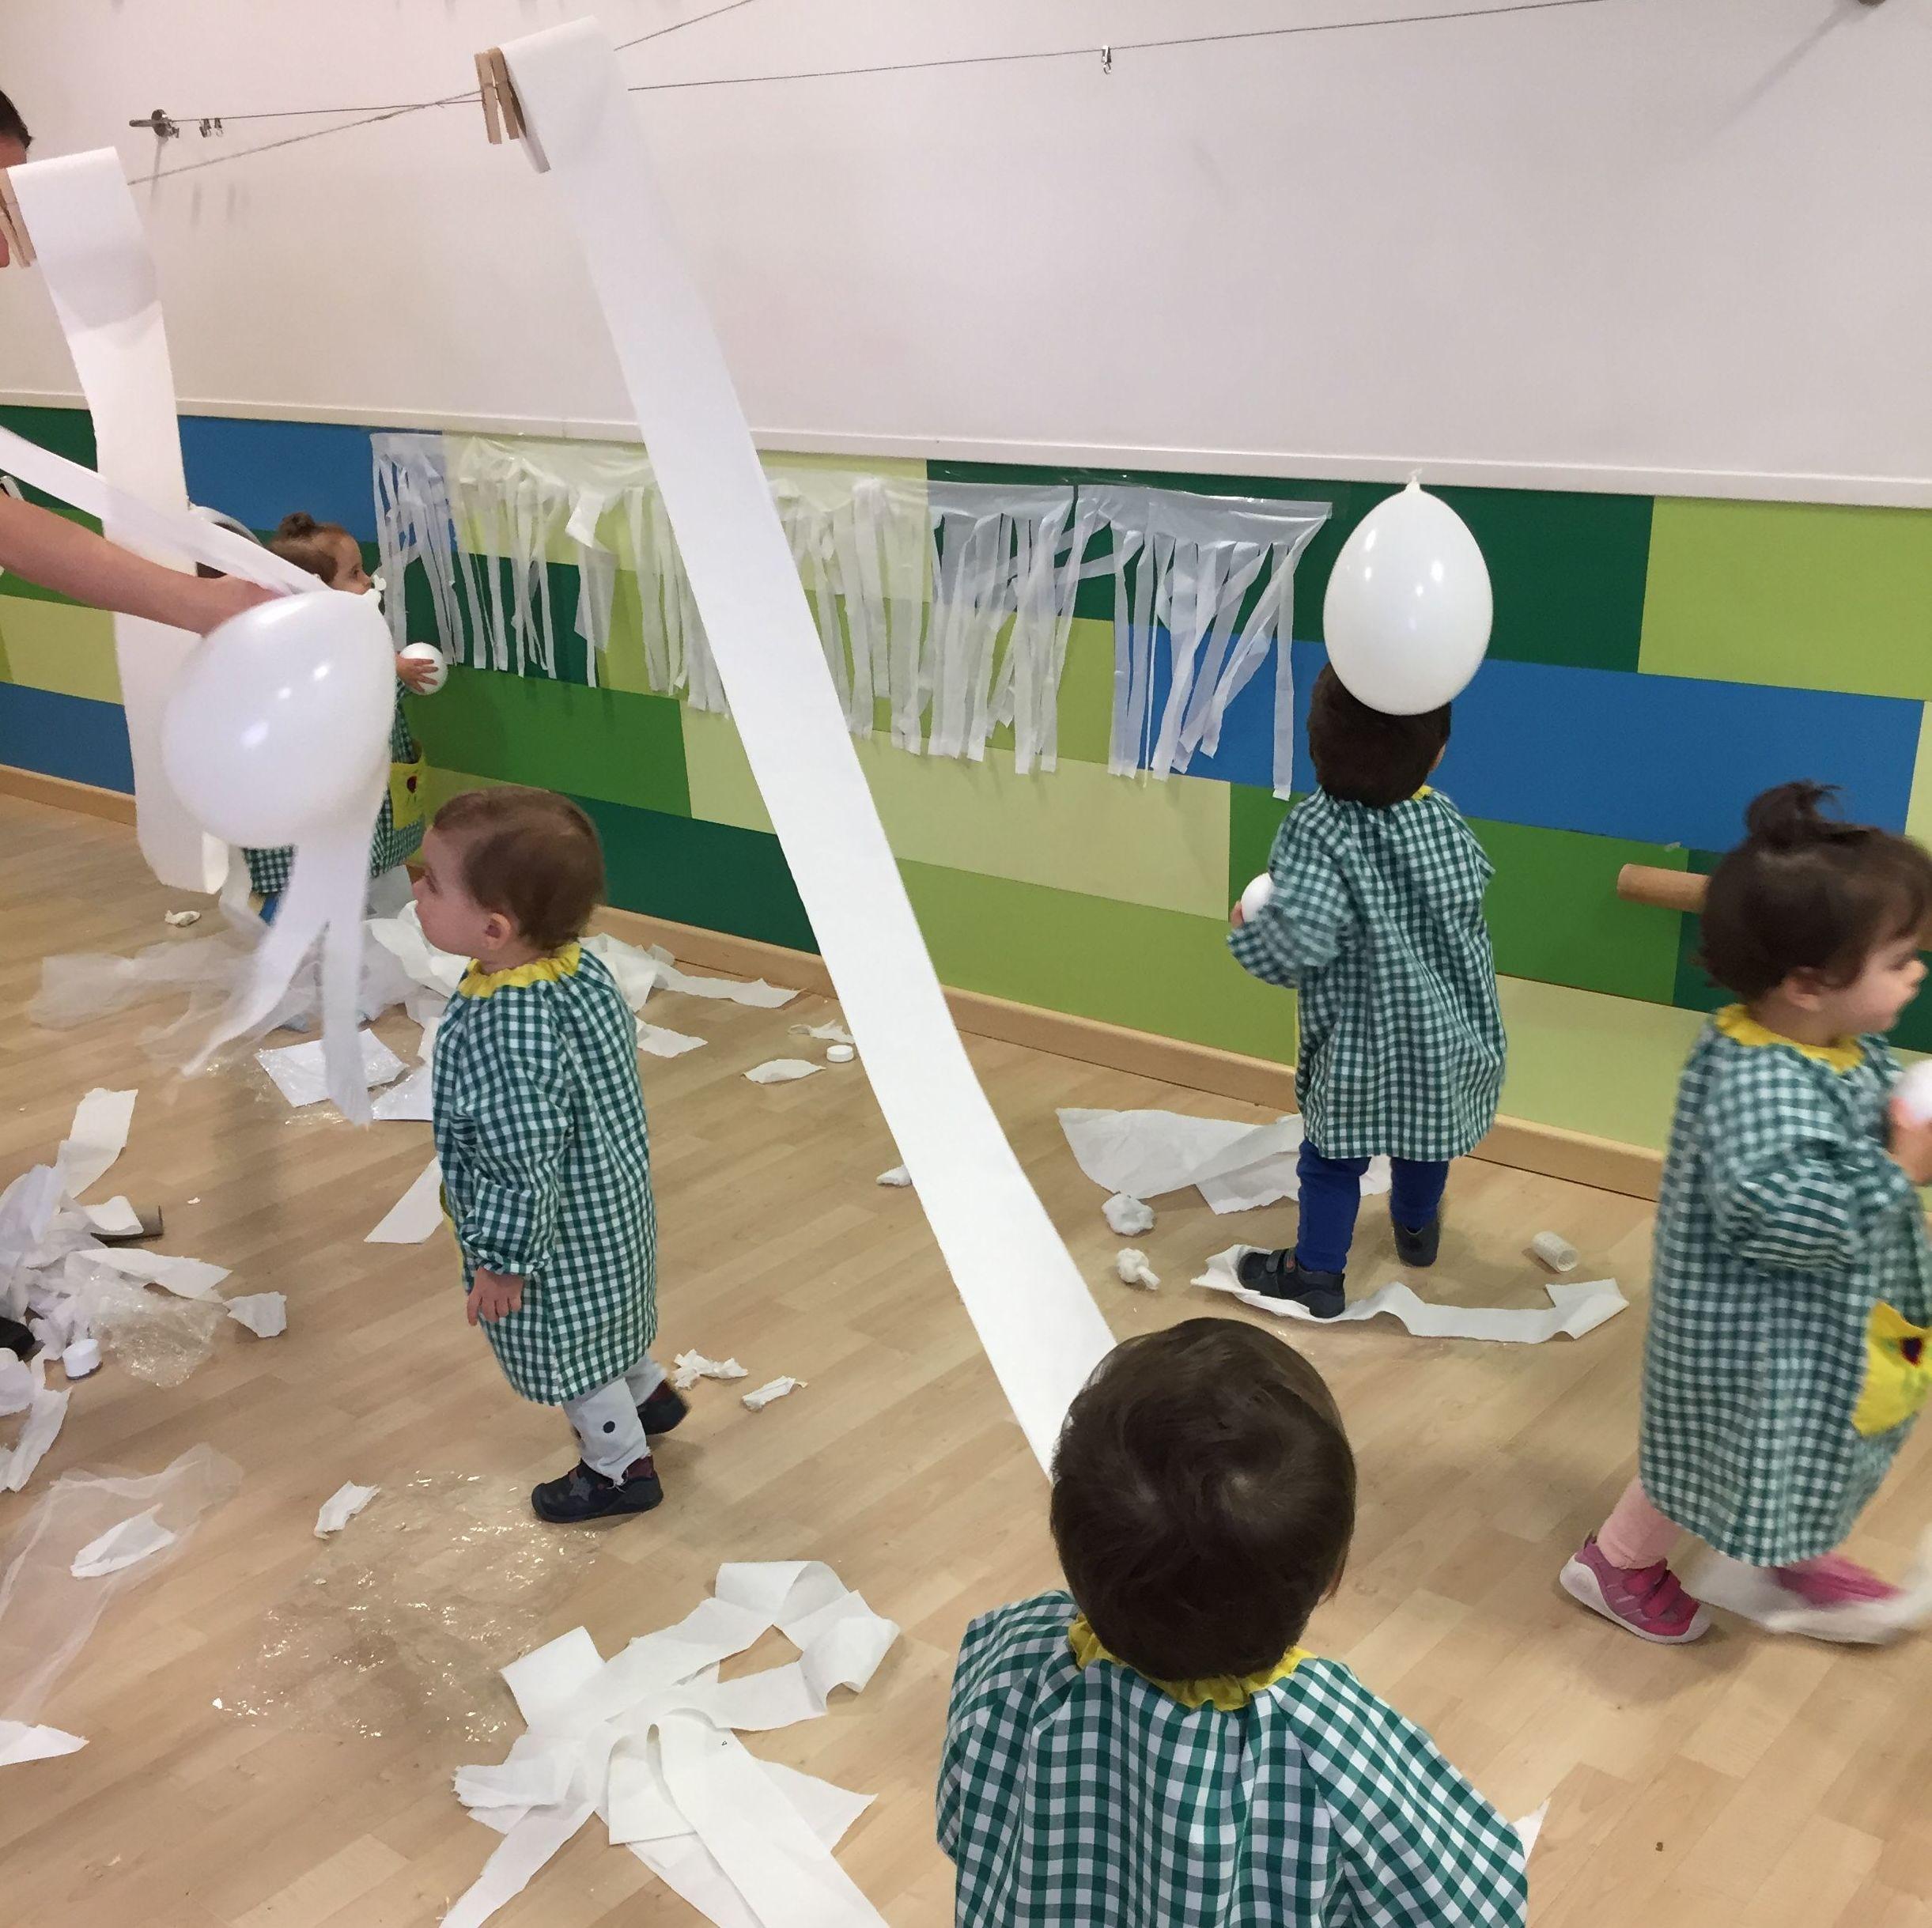 Foto 38 de Escuela Infantil en  | Escuela Infantil La Cotorrera